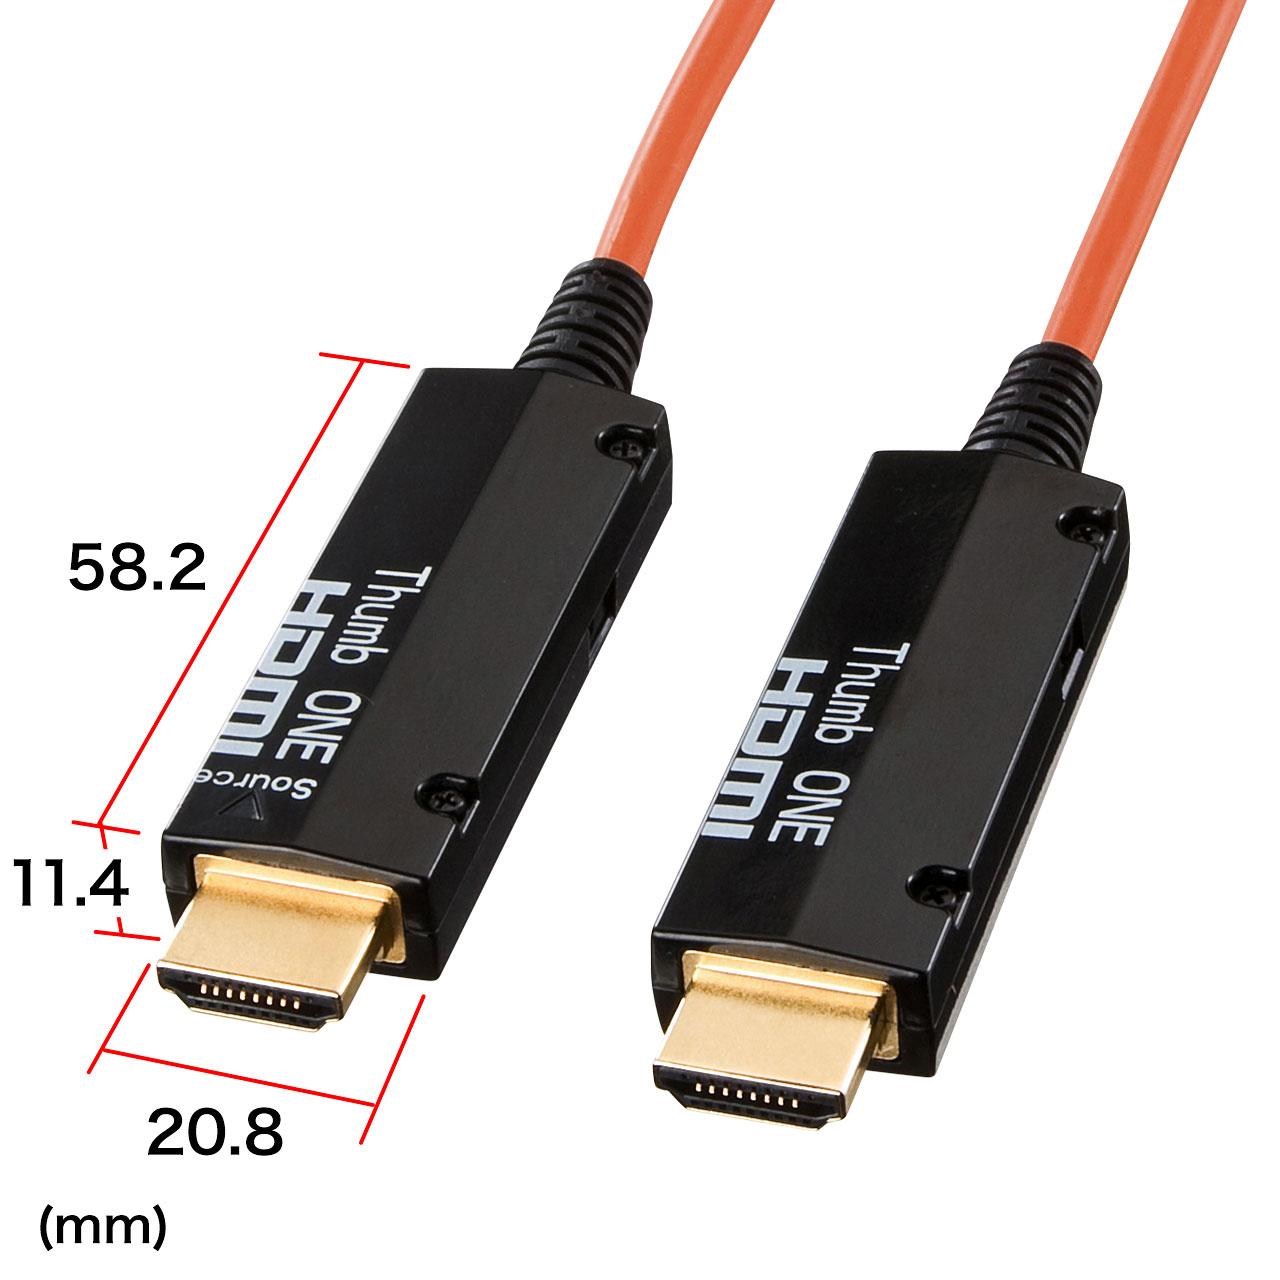 SANWA SUPPLY ケーブル長 100m 現品 長距離でも安定した信号を伝送可能な850nm光ファイバを採用 対応解像度 480p 720p 1080i 1080p セール特価品 DeepColor対応 08 長距離伝送可能な光ファイバ採用 離れた場所に便利 23AM 取扱説明書 1ケ KM-HD20-FB100 在庫潤沢 劣化しにくい金メッキピン 付属 ACアダプタ サンワサプライ 光ファイバHDMIケーブル